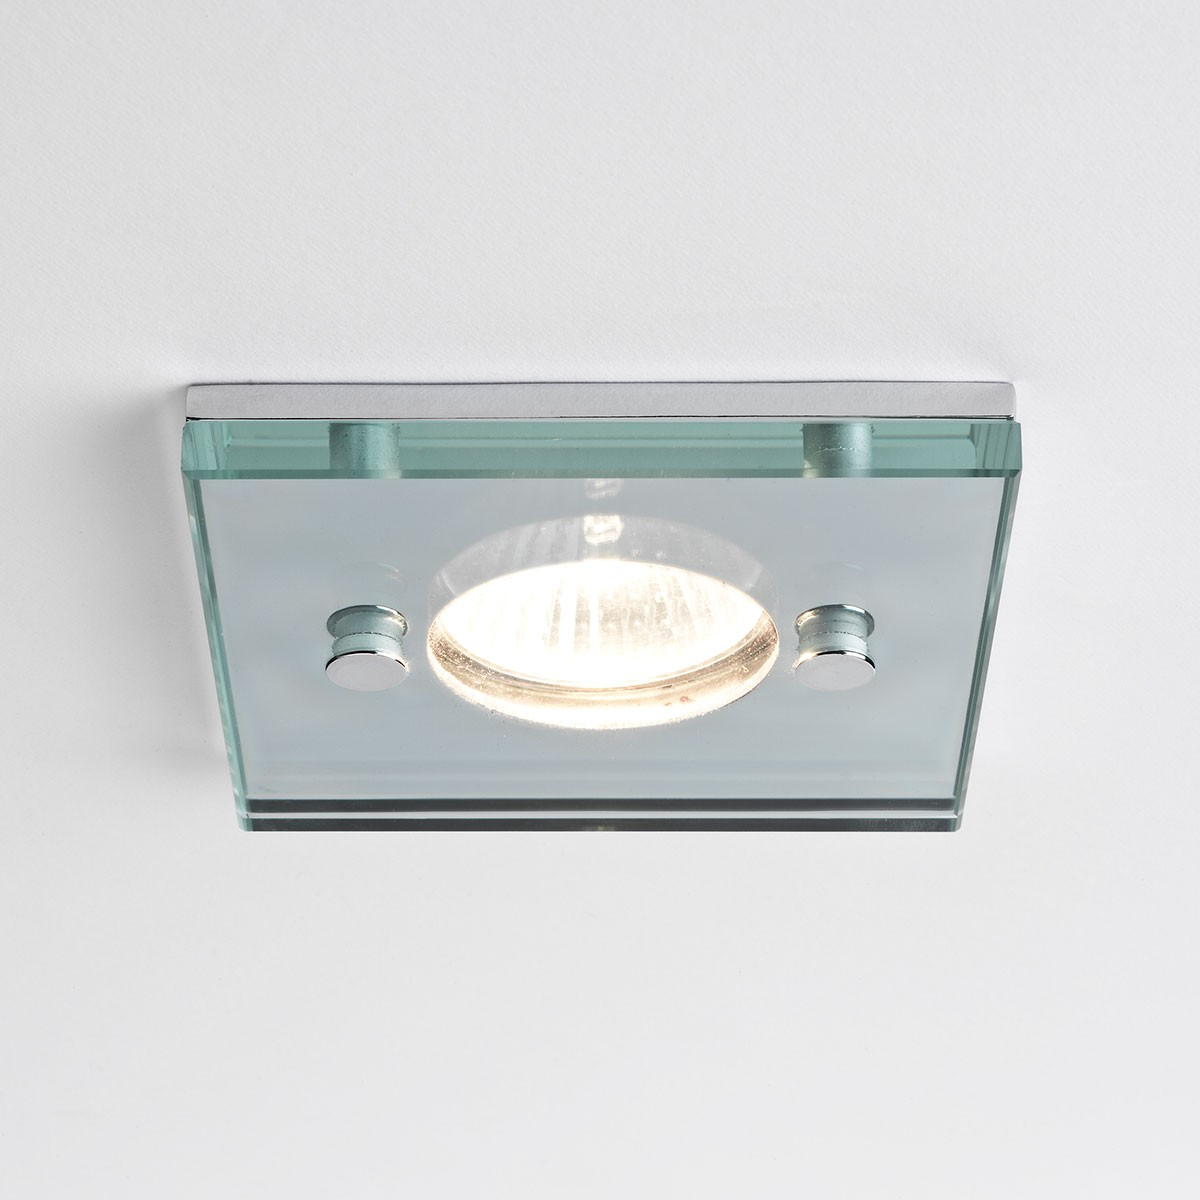 ASTRO+ICE ruut 1x11W GU10 CFL 230V IP65 valgusallikas komplektis